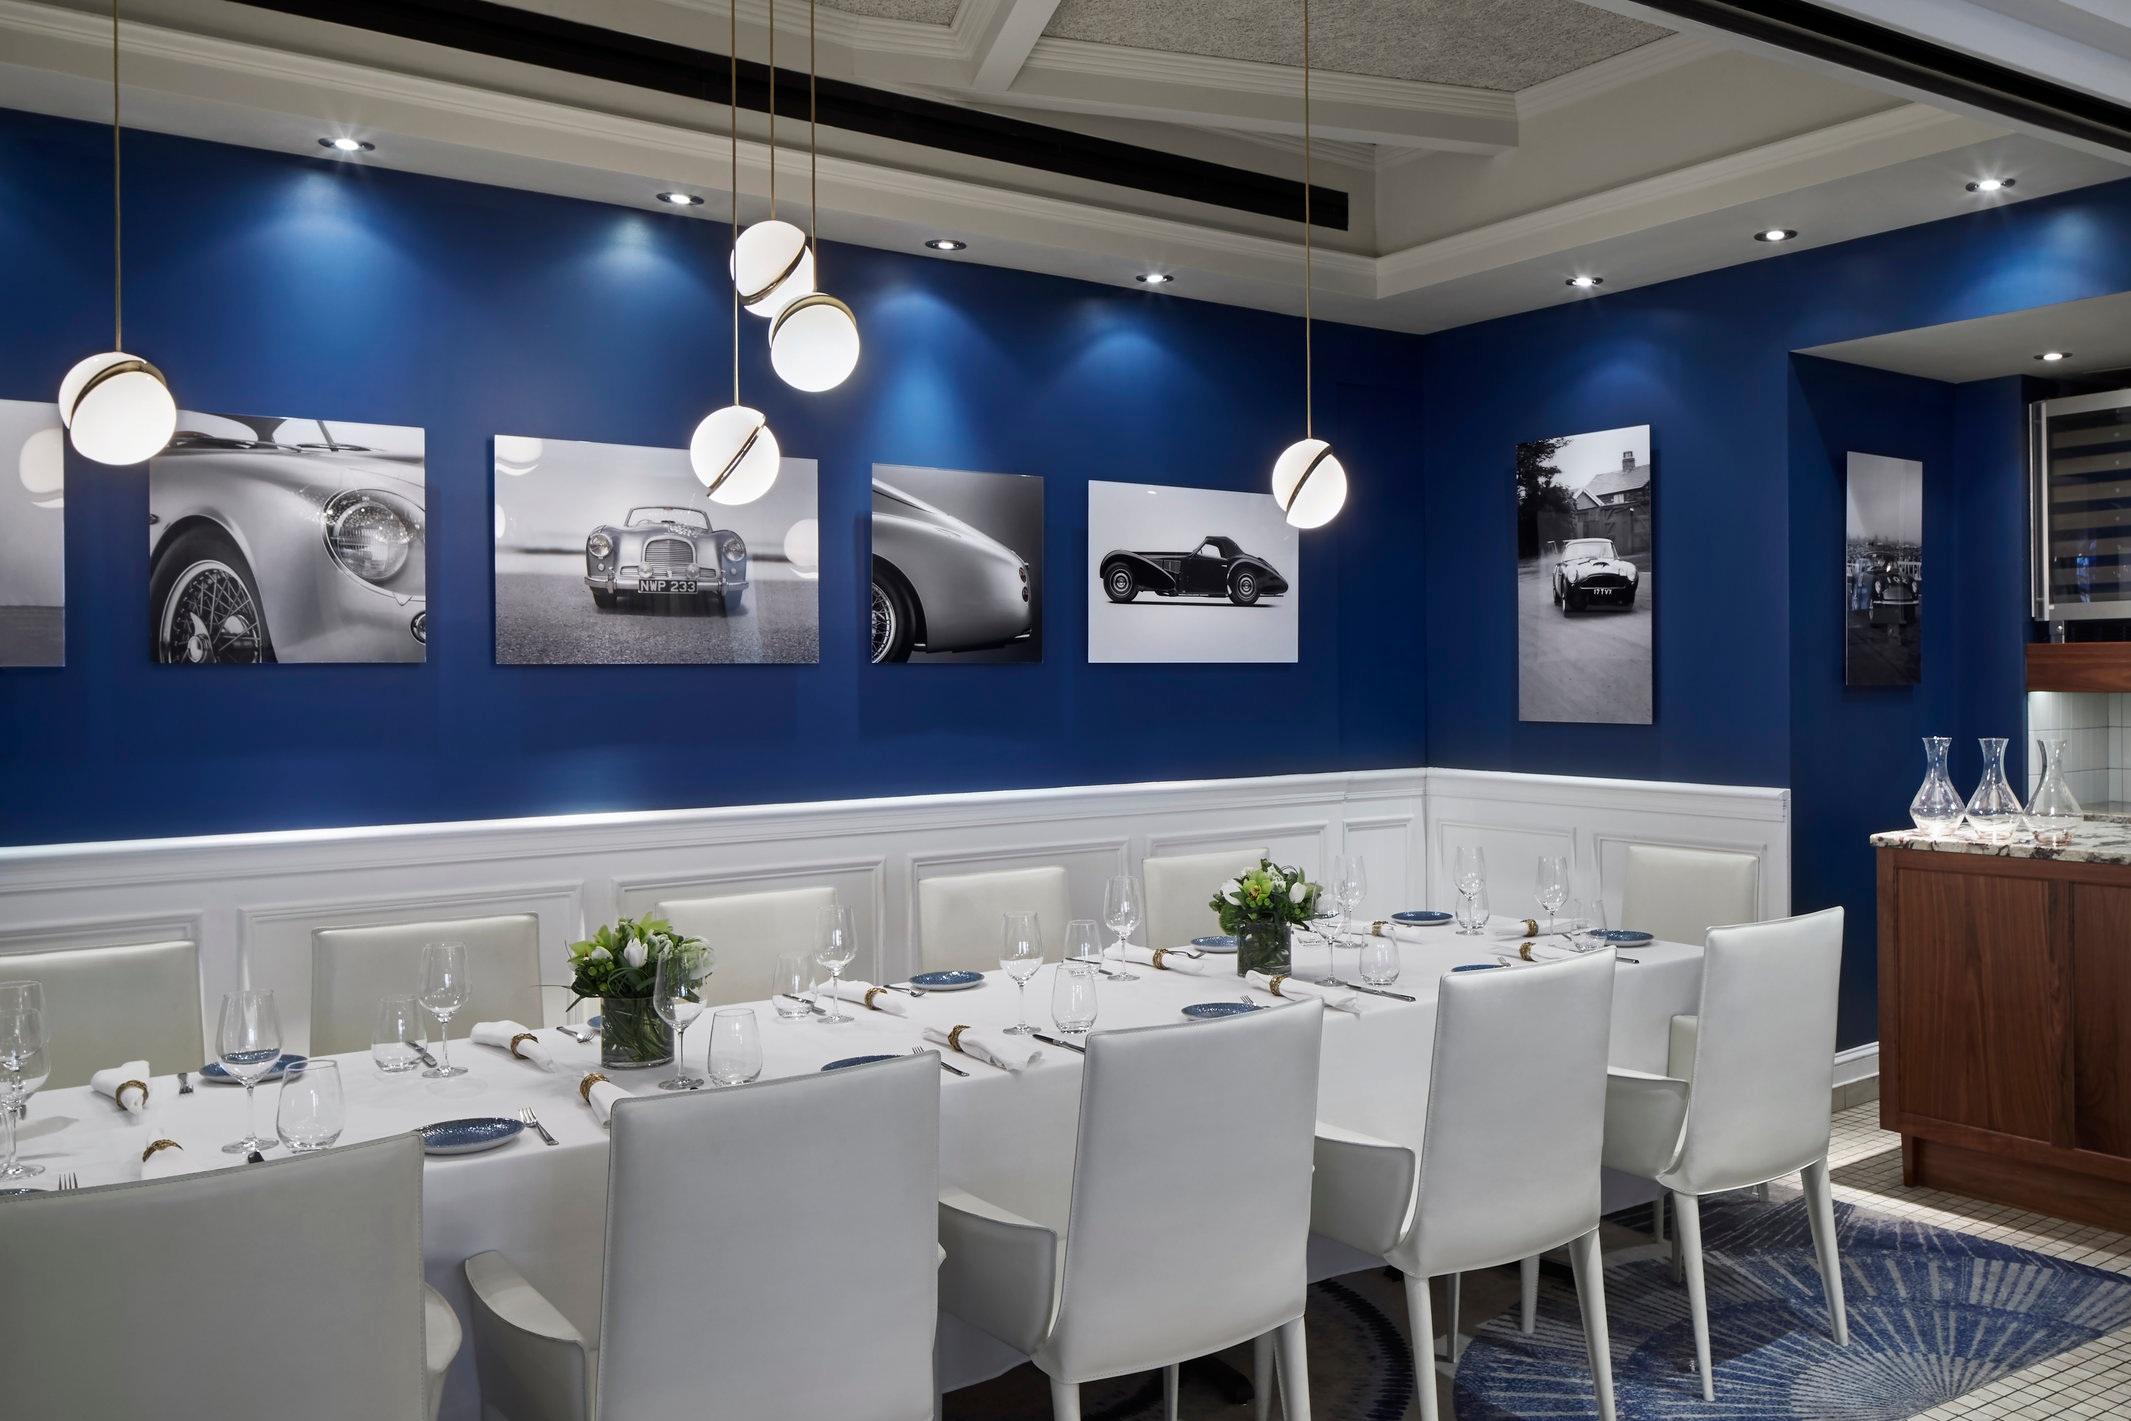 The Aston Martin Room